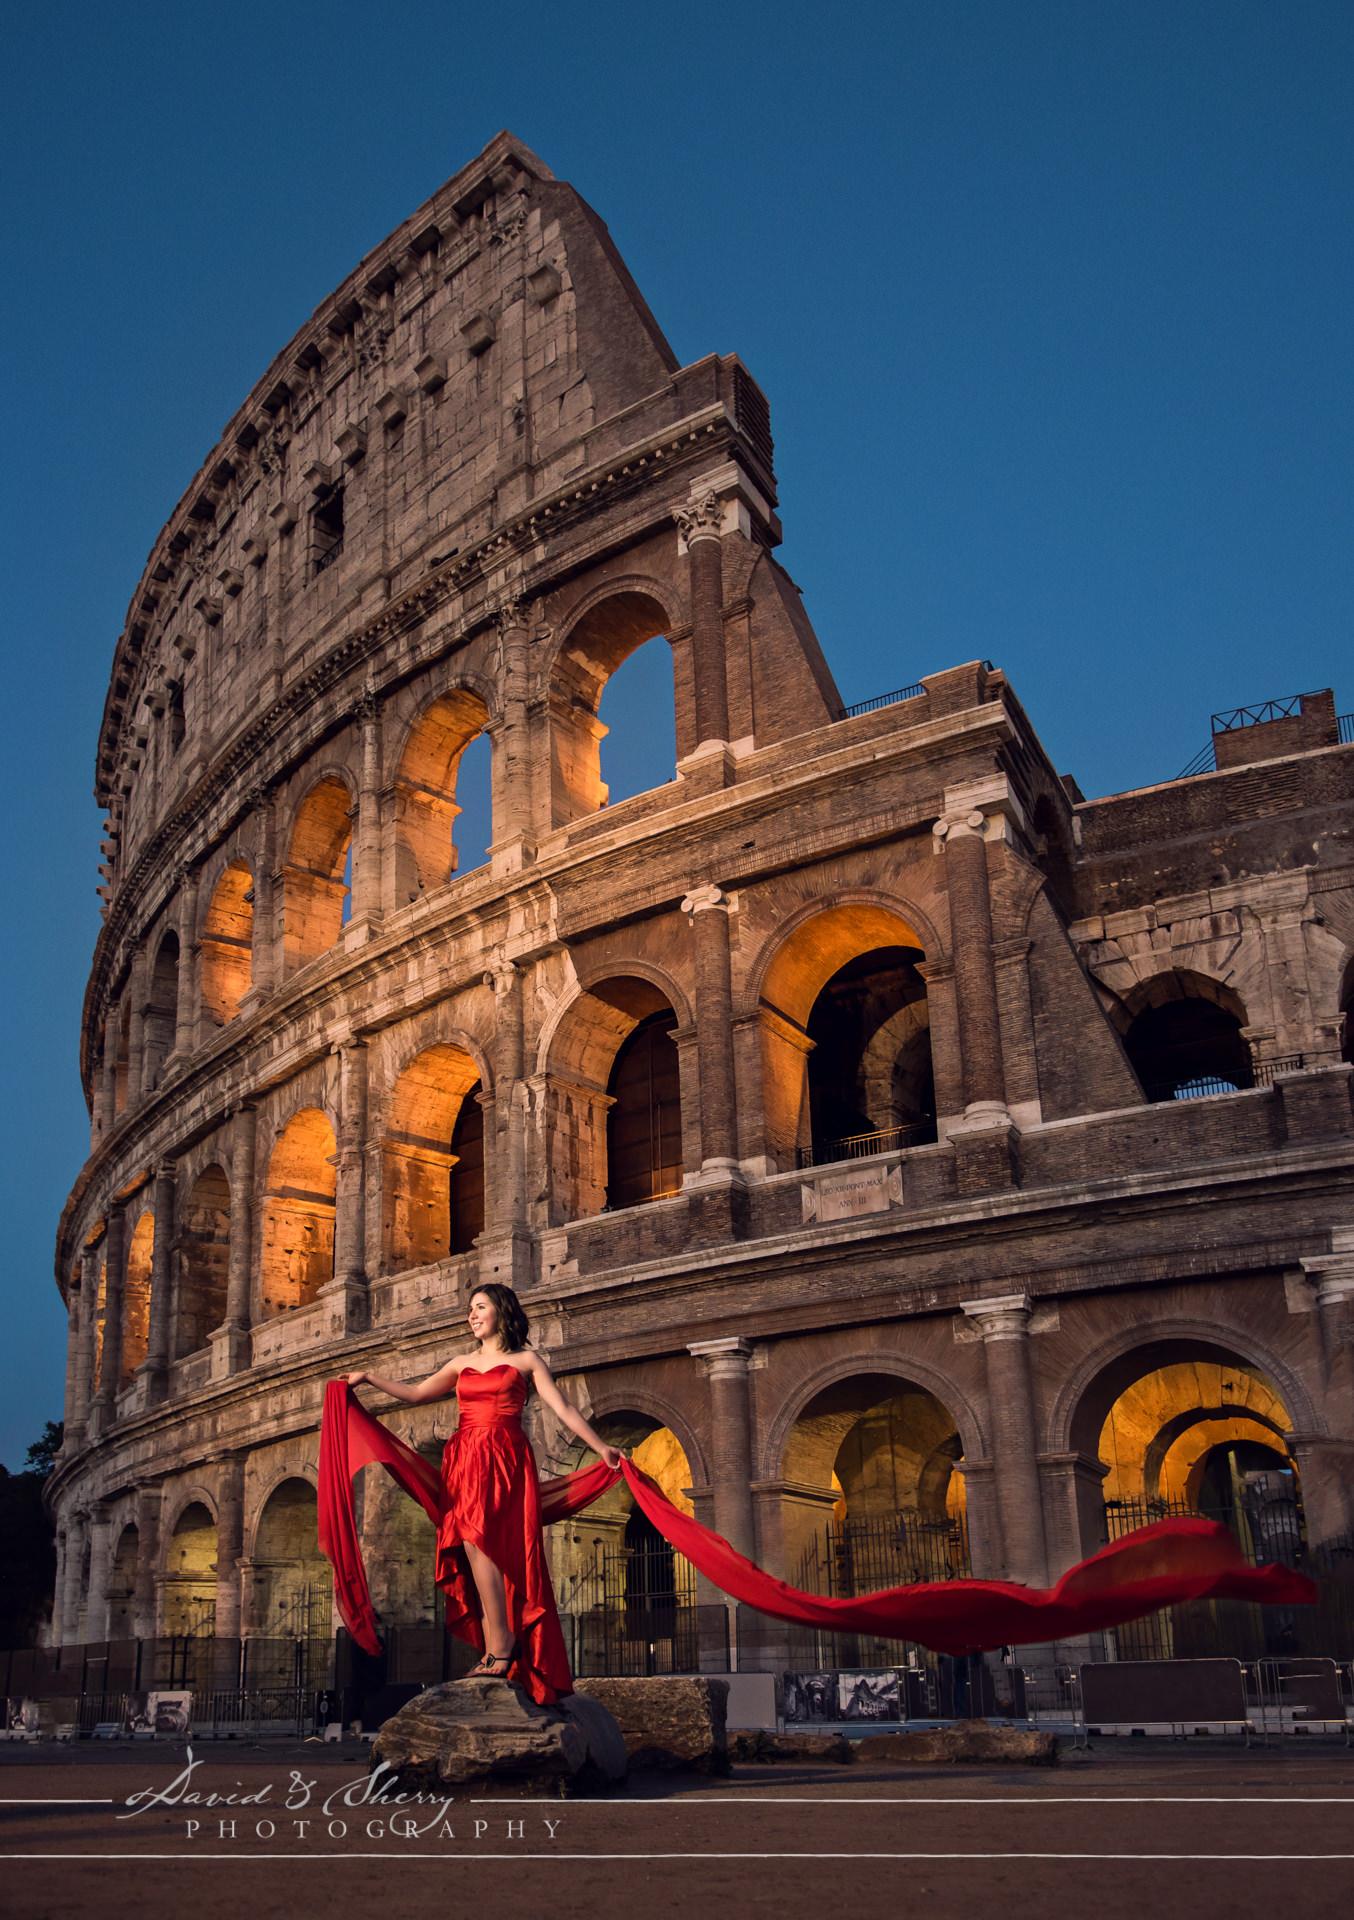 Bride at destination in Rome Italy